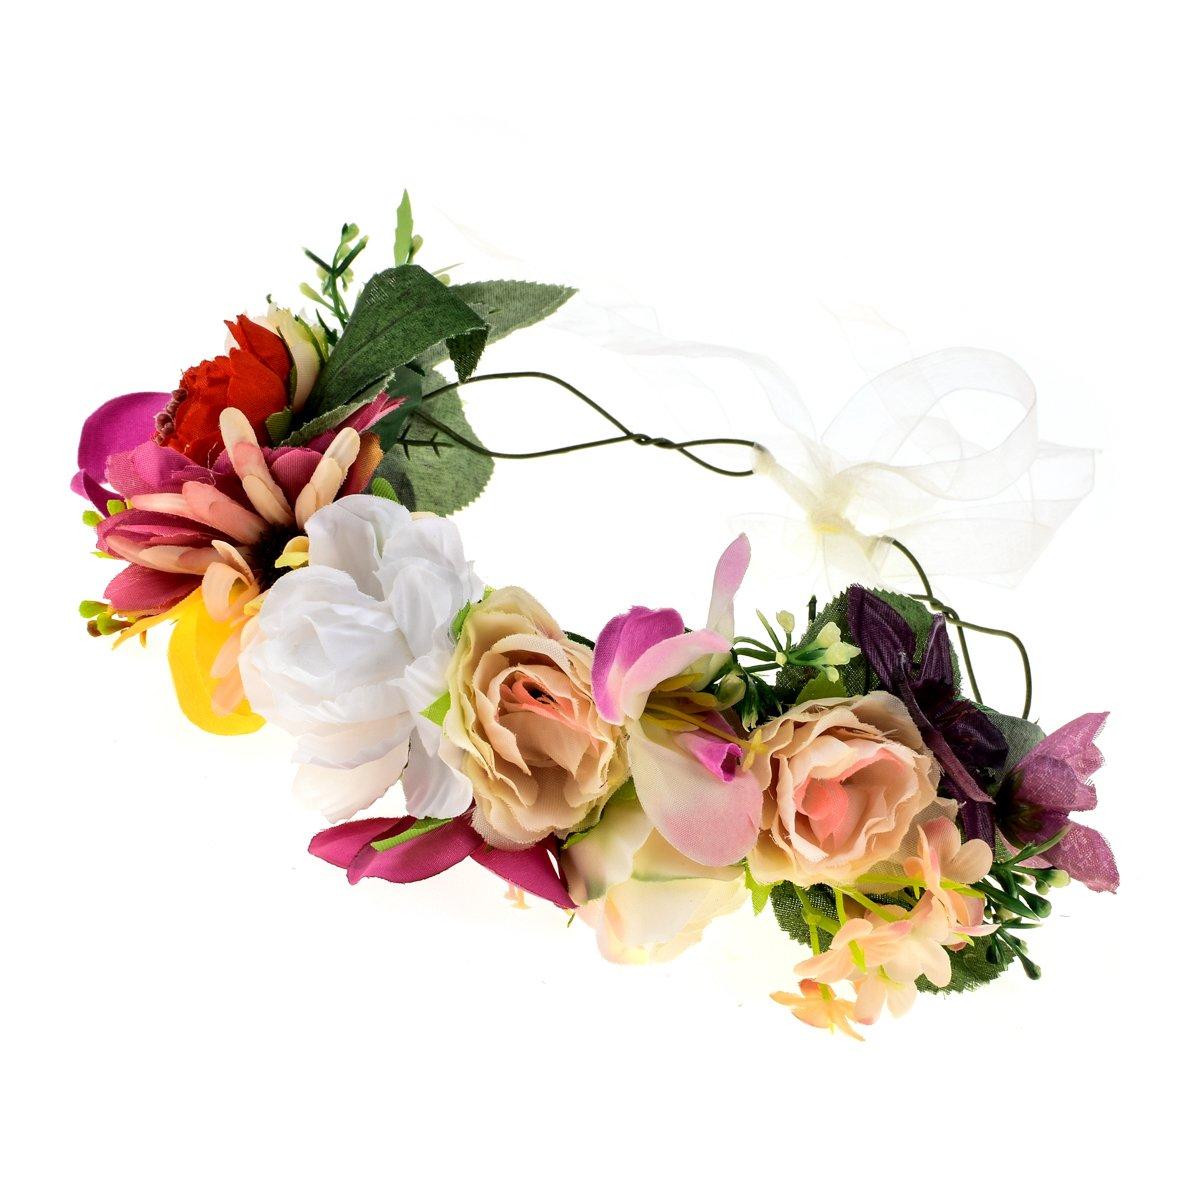 Merroyal Flower Girl Crown Bride Floral Crowns Maternity Bridesmaid Hair Wreath Wedding Photo Props